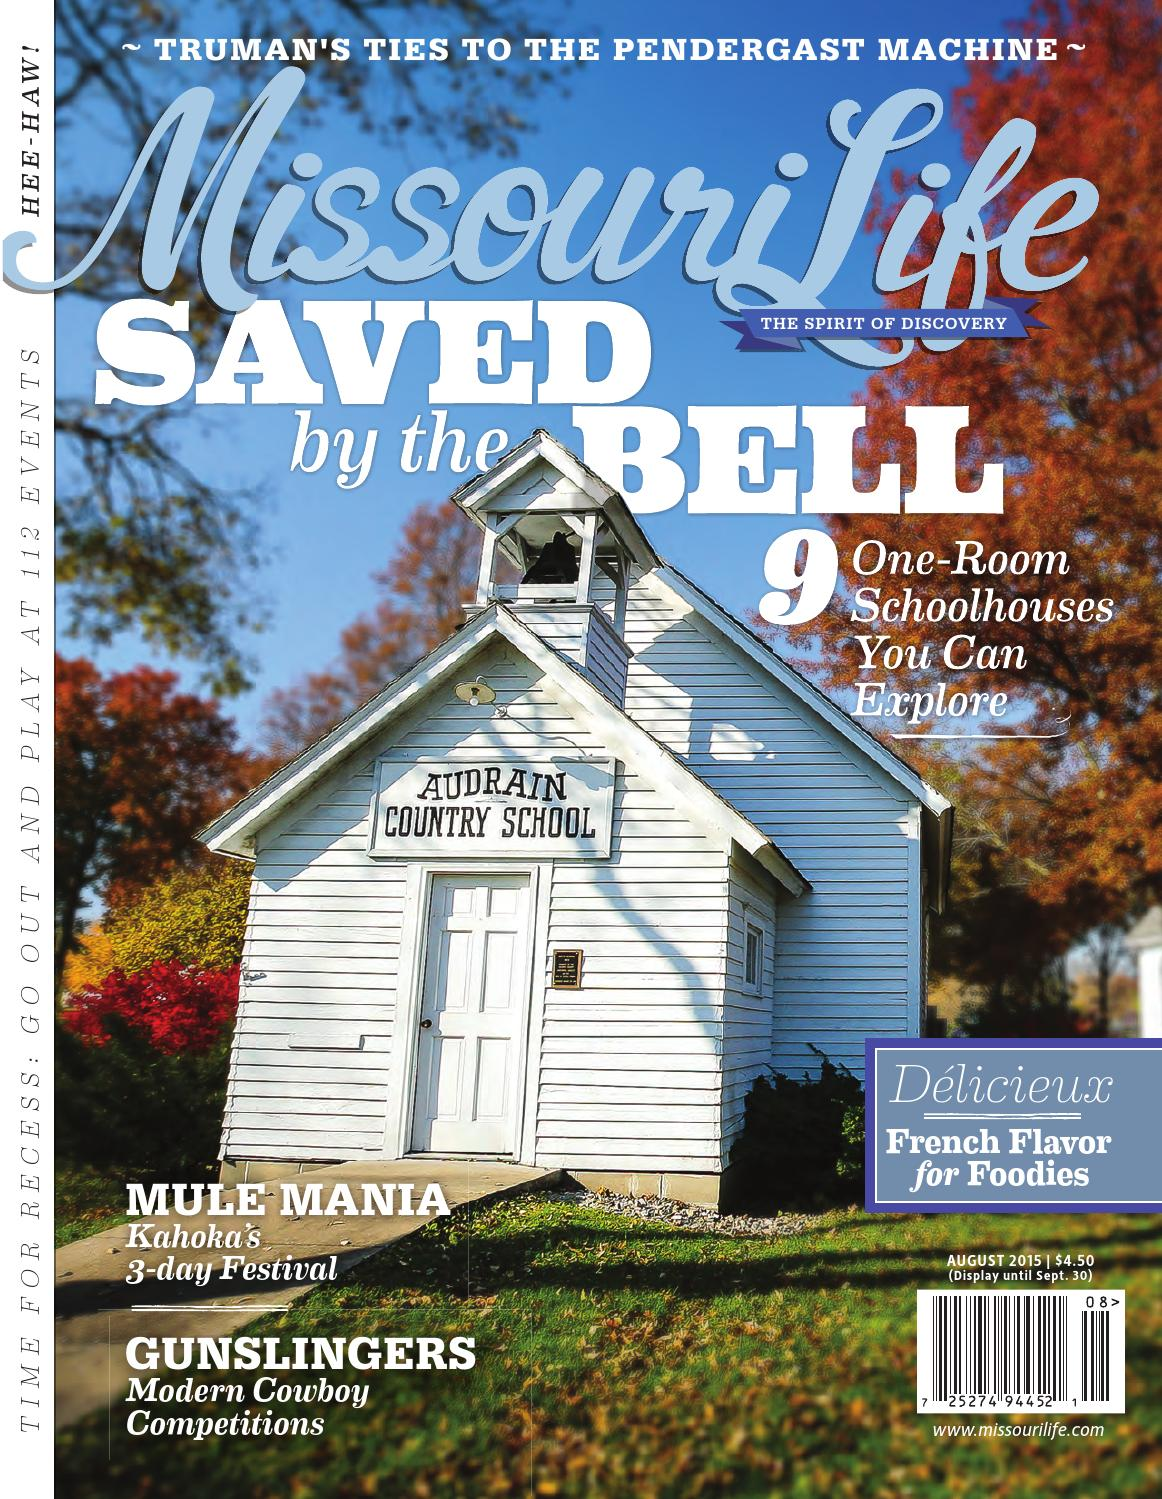 Missouri Life August/September 2015 by Missouri Life Magazine - issuu